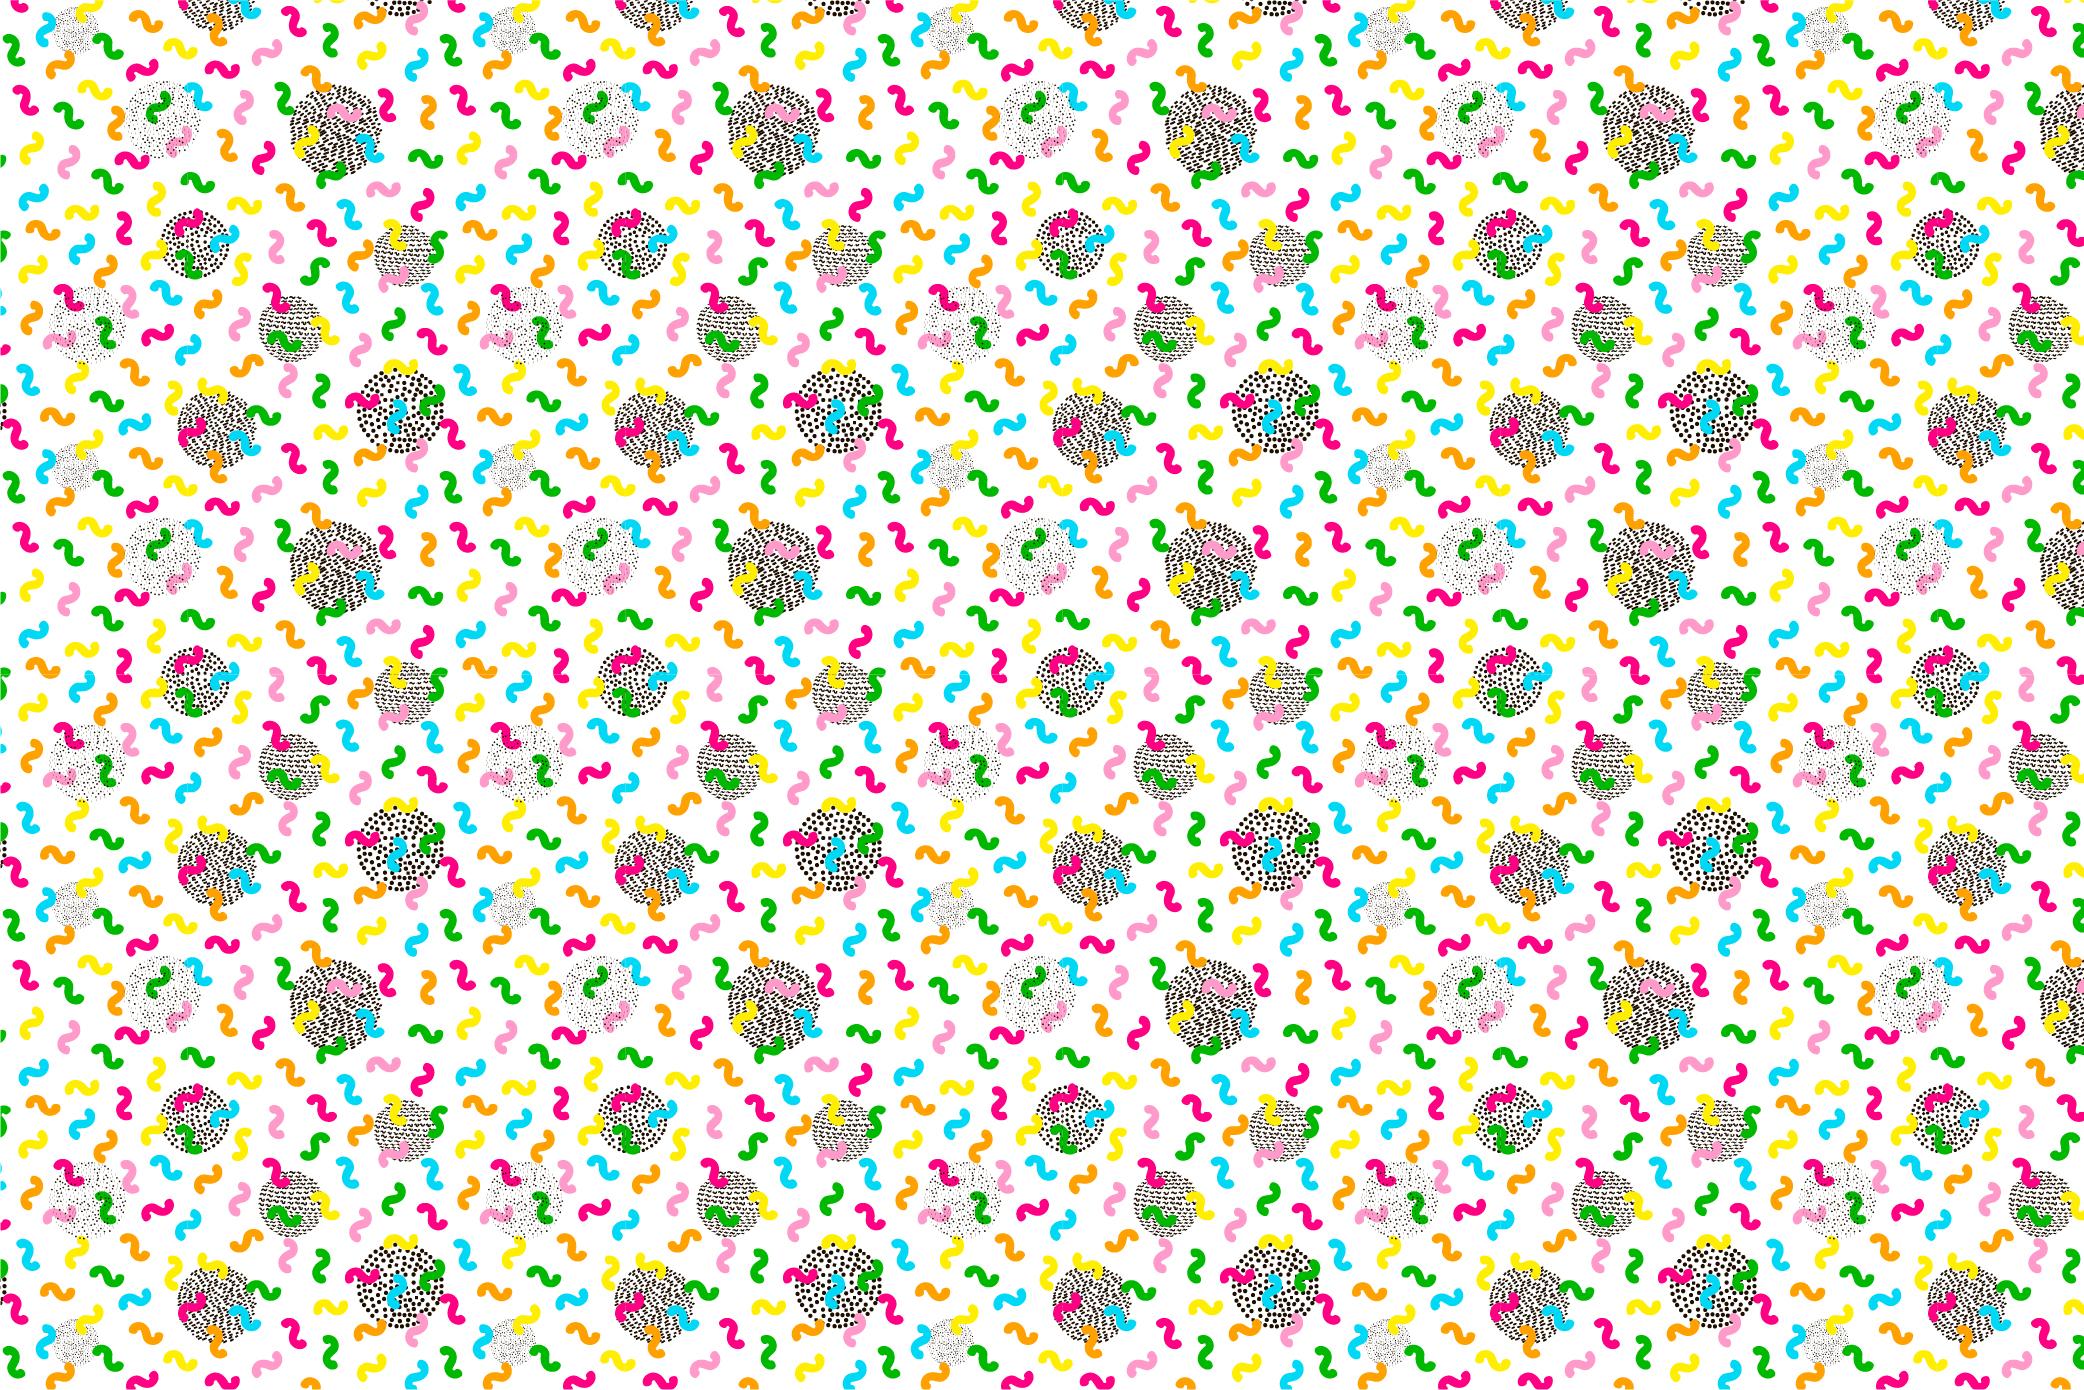 9 Geometric seamless patterns. Ai, EPS, JPG, SVG example image 6